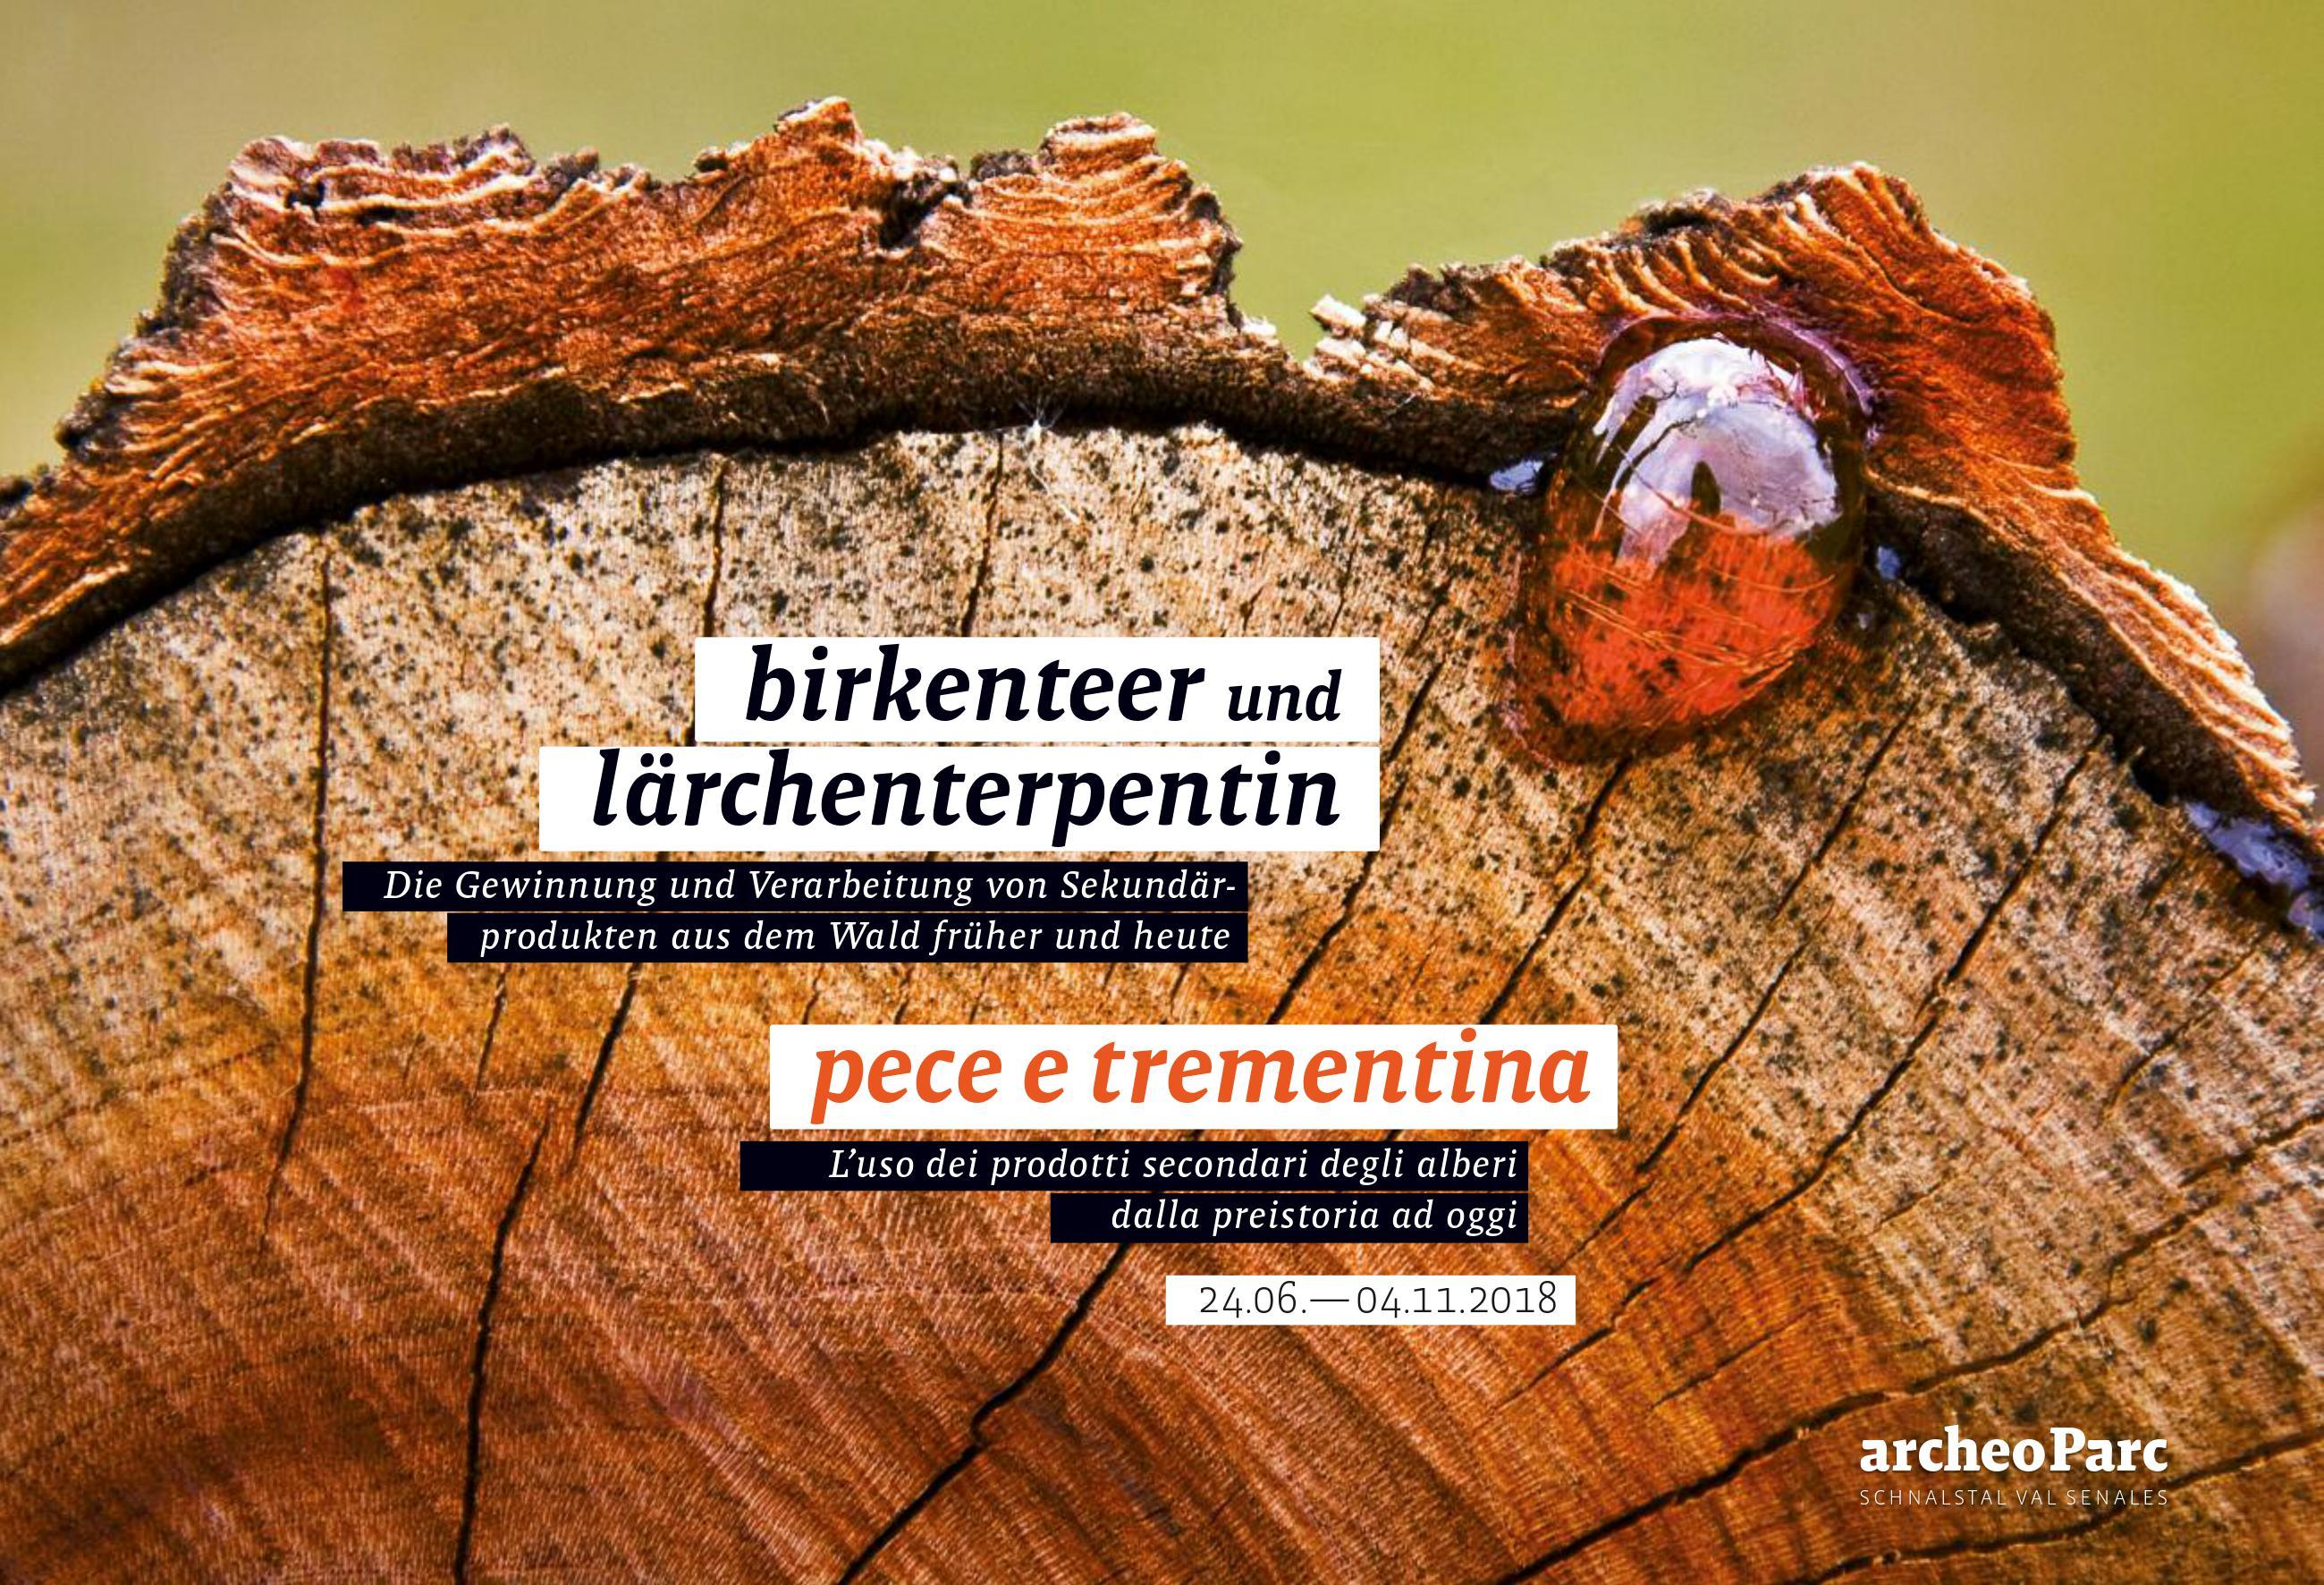 "Einladung zur Sonderausstellung 2018 im archeoParc Schnalstal ""Birkenteer und Lärchenterpentin""<br/>Invito per l'inaugurazione della mostra temporanea 2018 ""Pece e trementina"" all'archeoParc Val Senales"